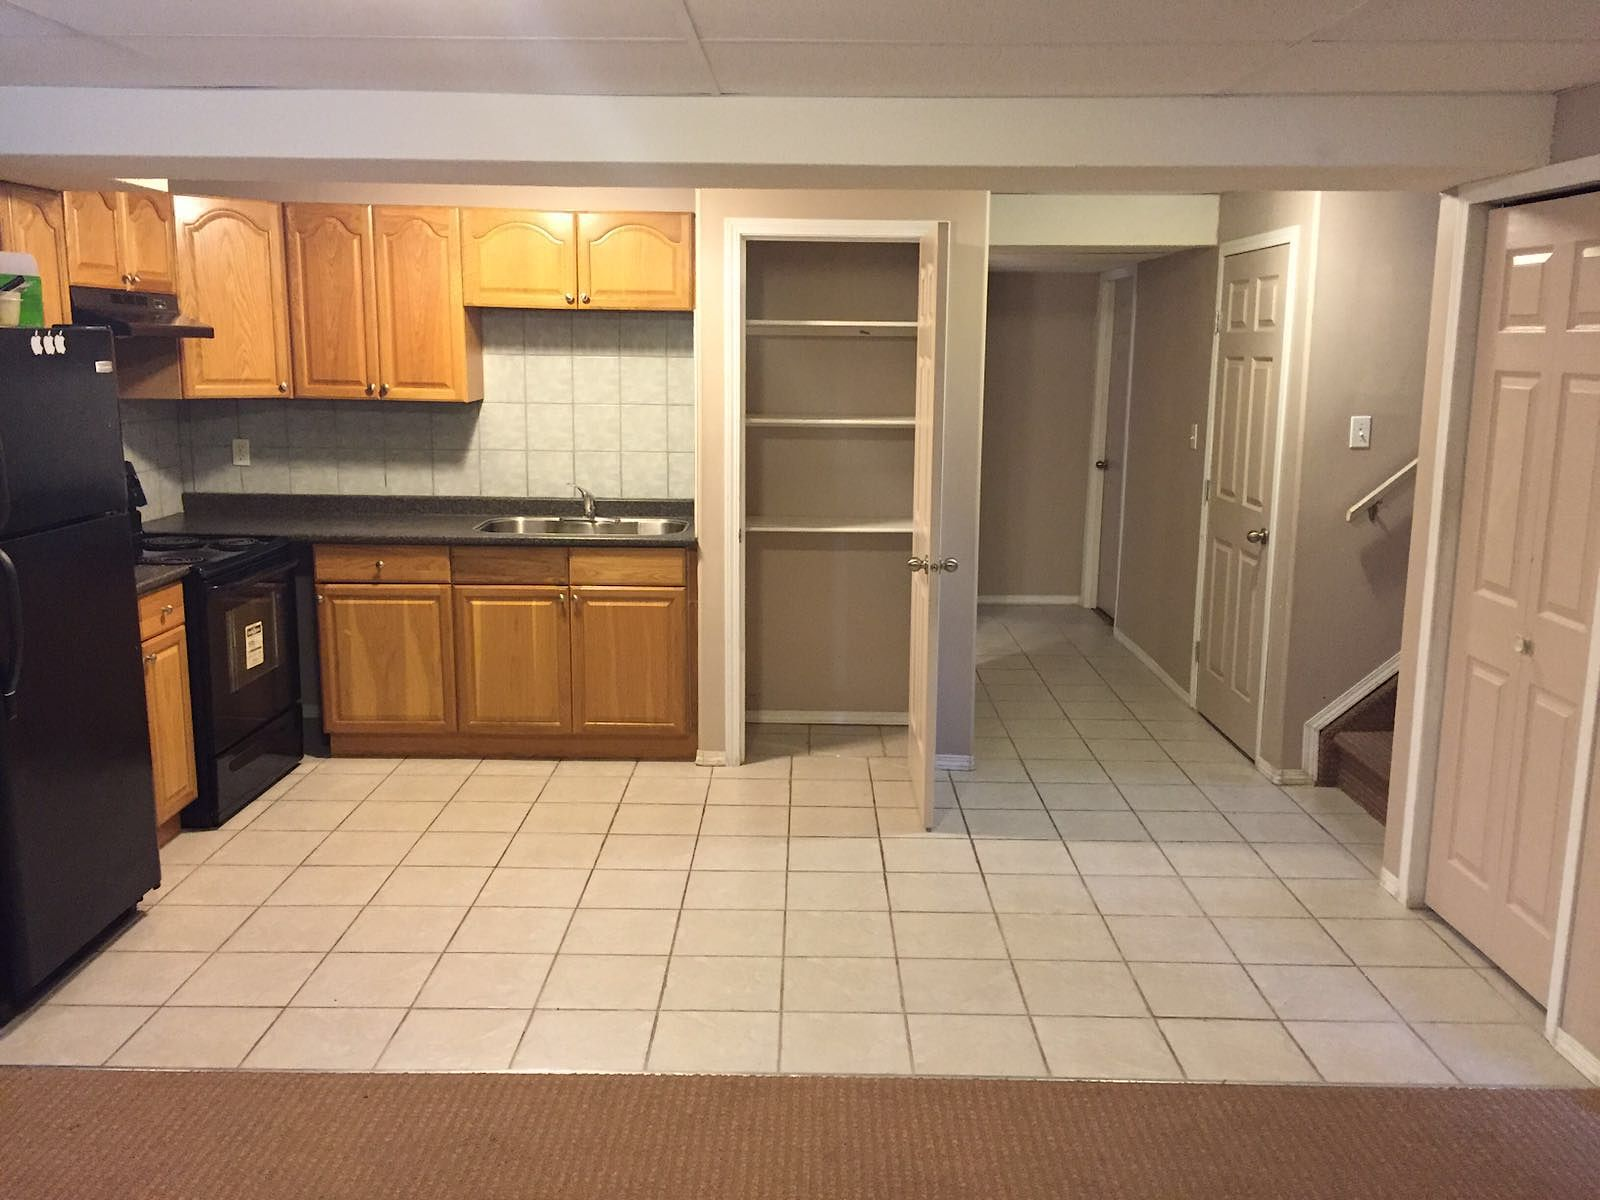 calgary basement for rent saddle ridge ne 1 bedrooms shared